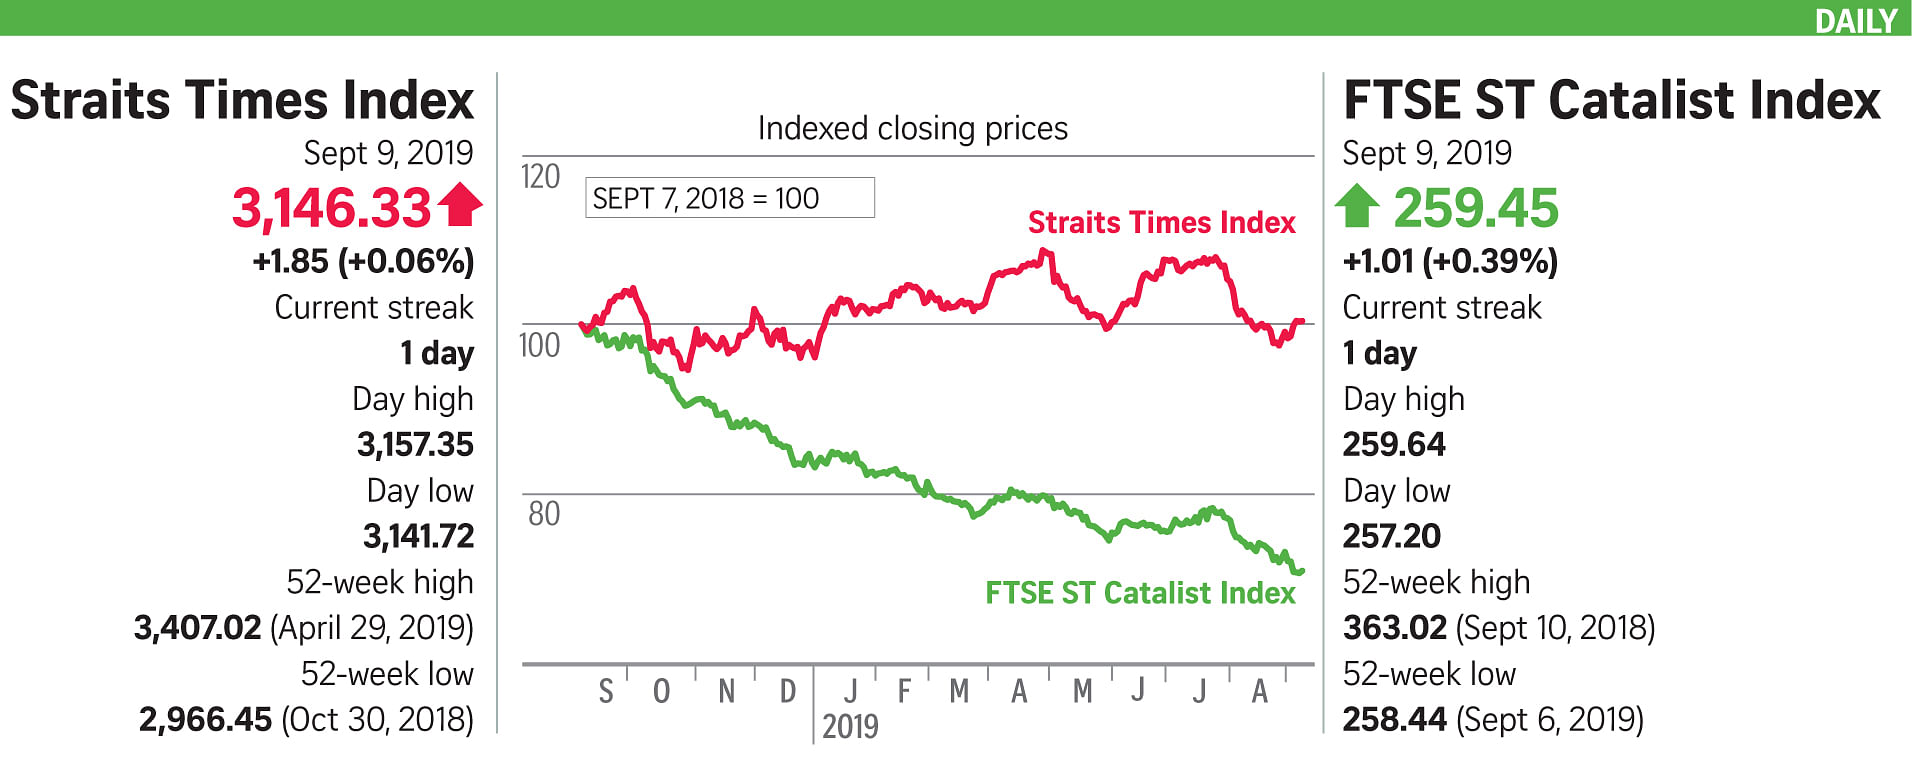 STI bucks regional trend to stay flat, Business News & Top